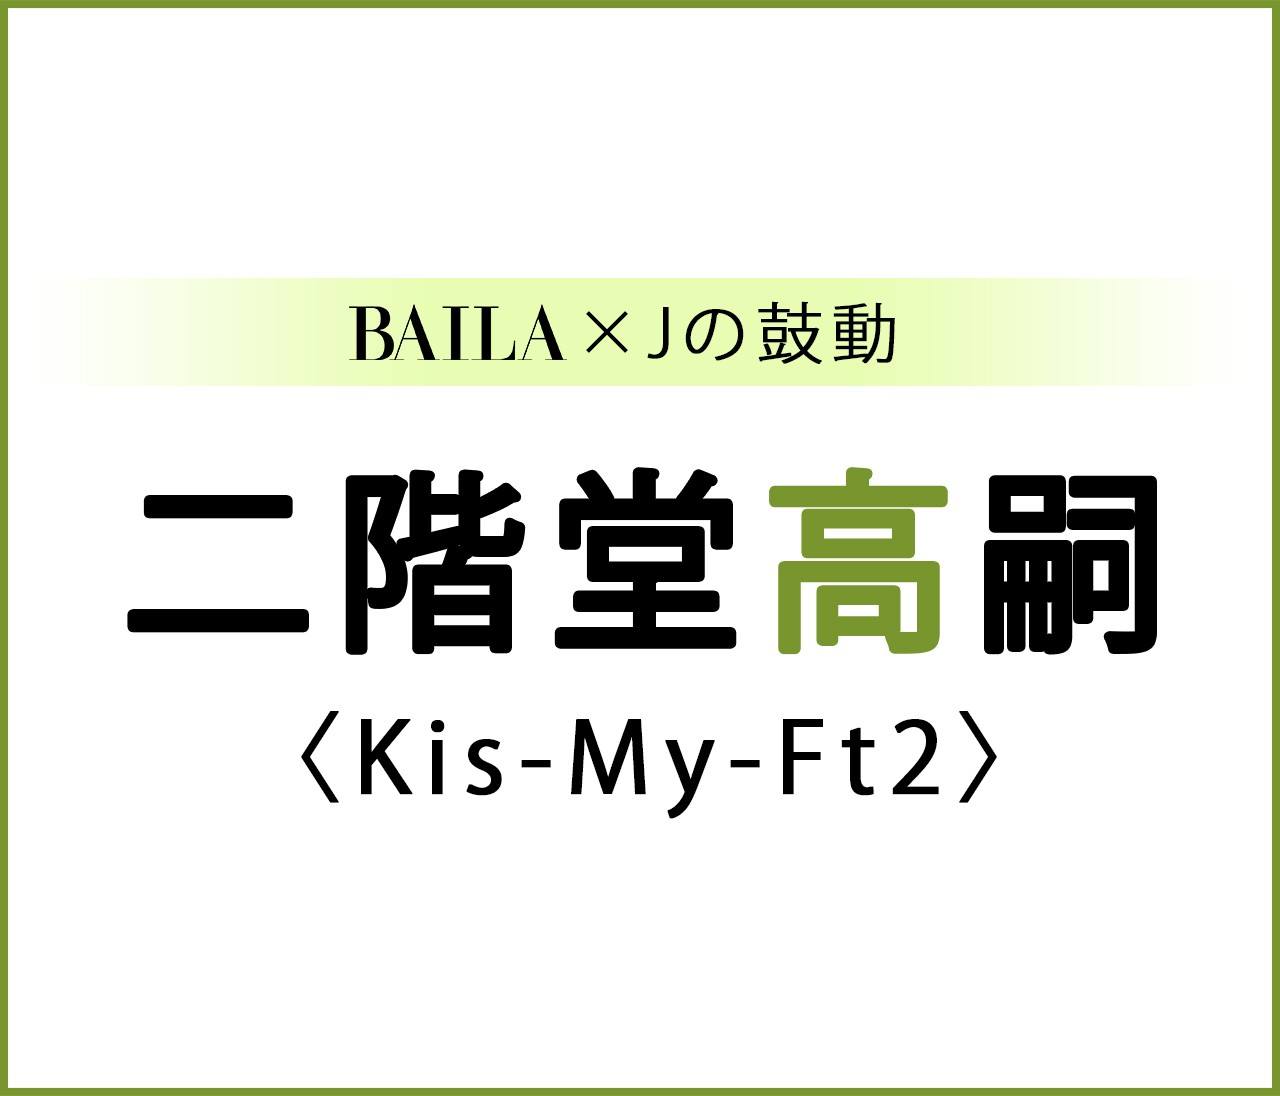 【 #KisMyFt2 #二階堂高嗣 】Kis-My-Ft2 二階堂高嗣スペシャルインタビュー!【BAILA × Jの鼓動】